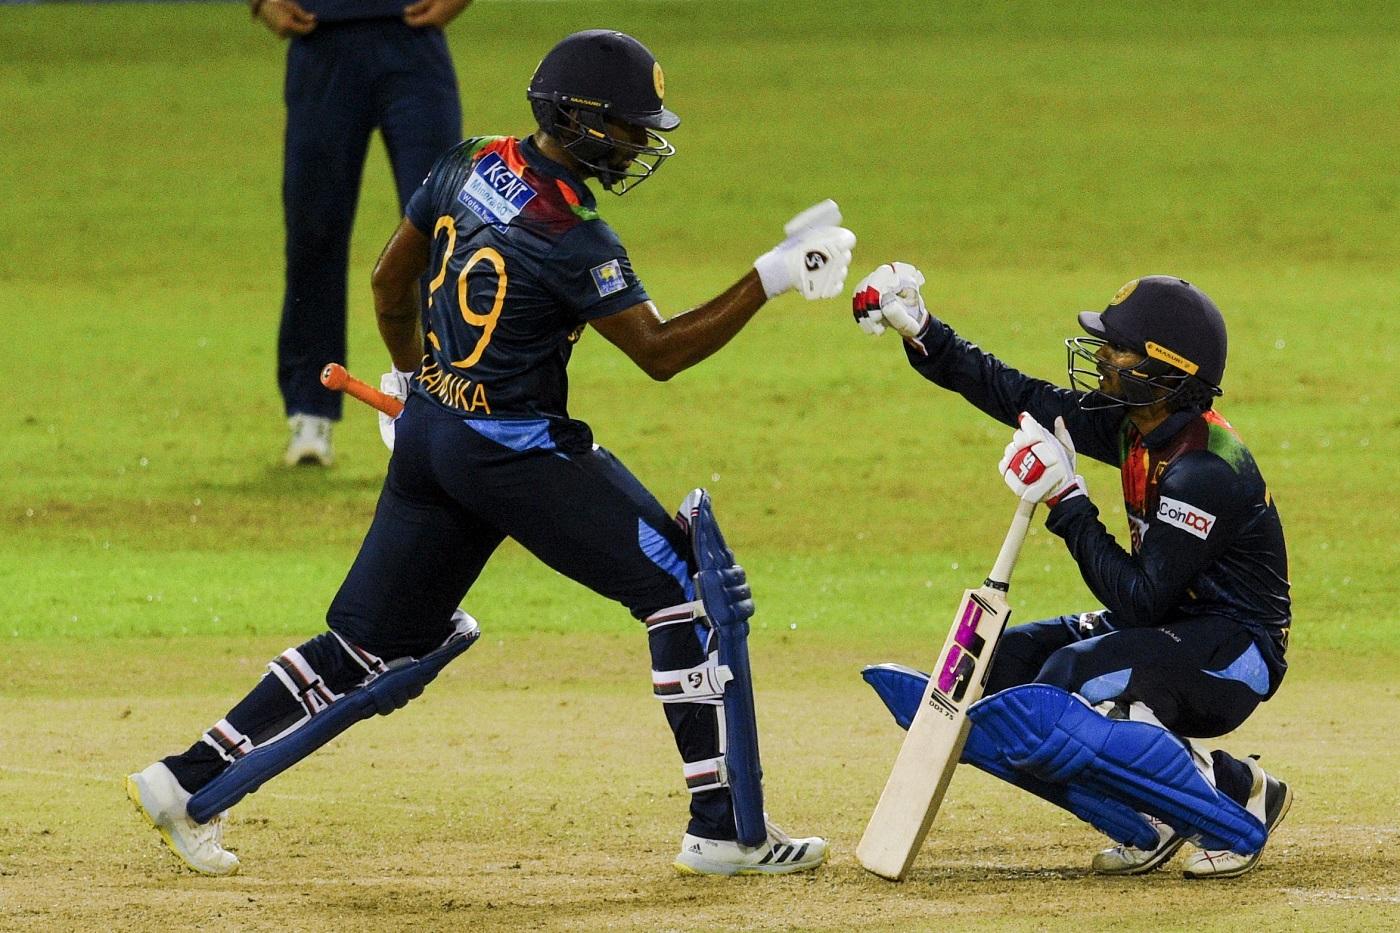 Sri Lanka beat India Sri Lanka won by 4 wickets (with 2 balls remaining) - India  vs Sri Lanka, India tour of Sri Lanka, 2nd T20I Match Summary, Report    ESPNcricinfo.com